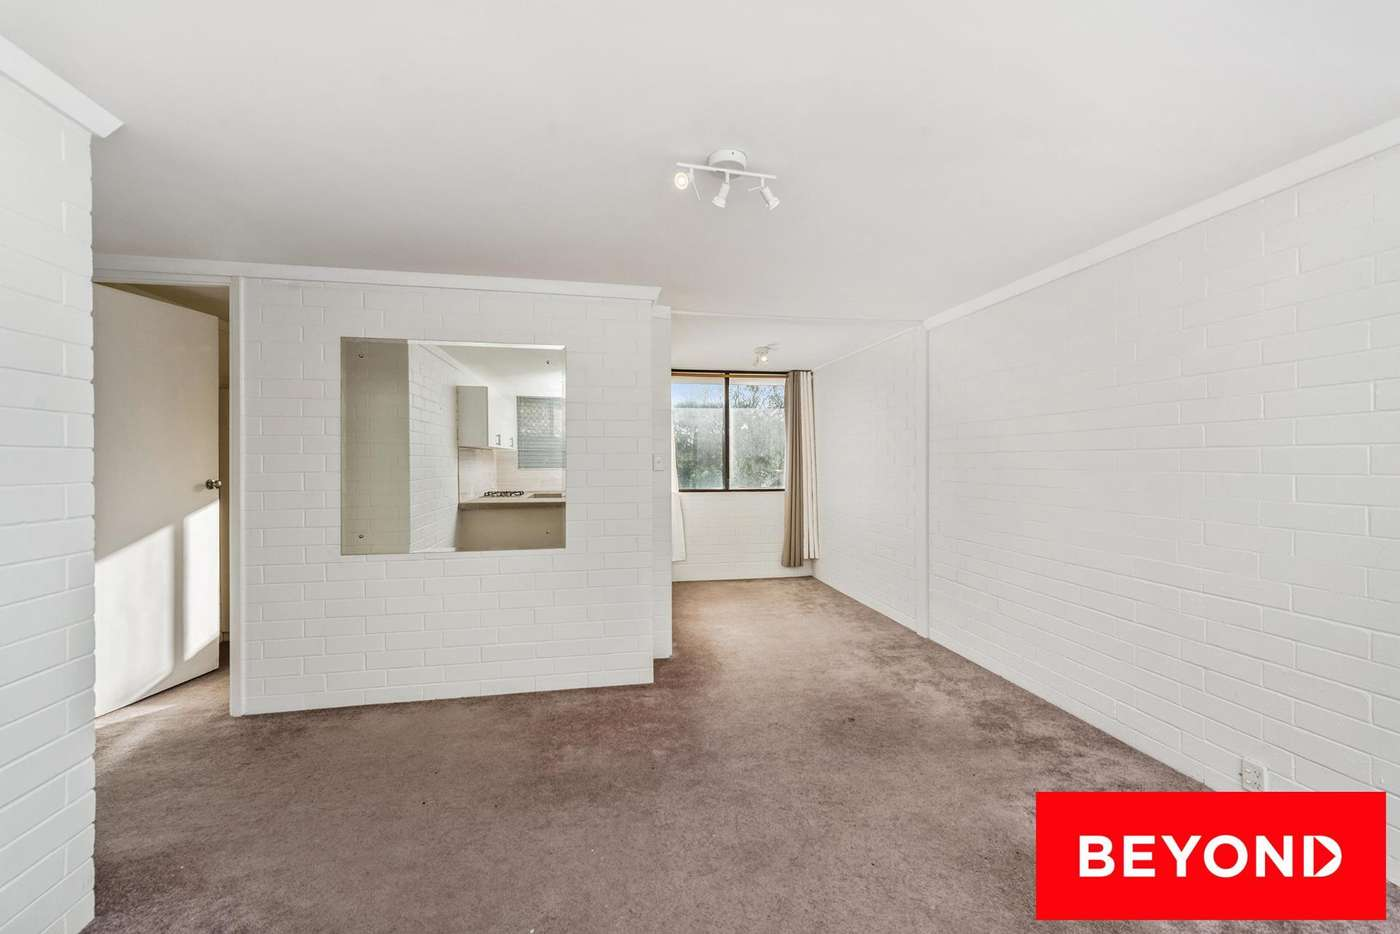 Main view of Homely apartment listing, 206C/25 Herdsman Parade, Wembley WA 6014